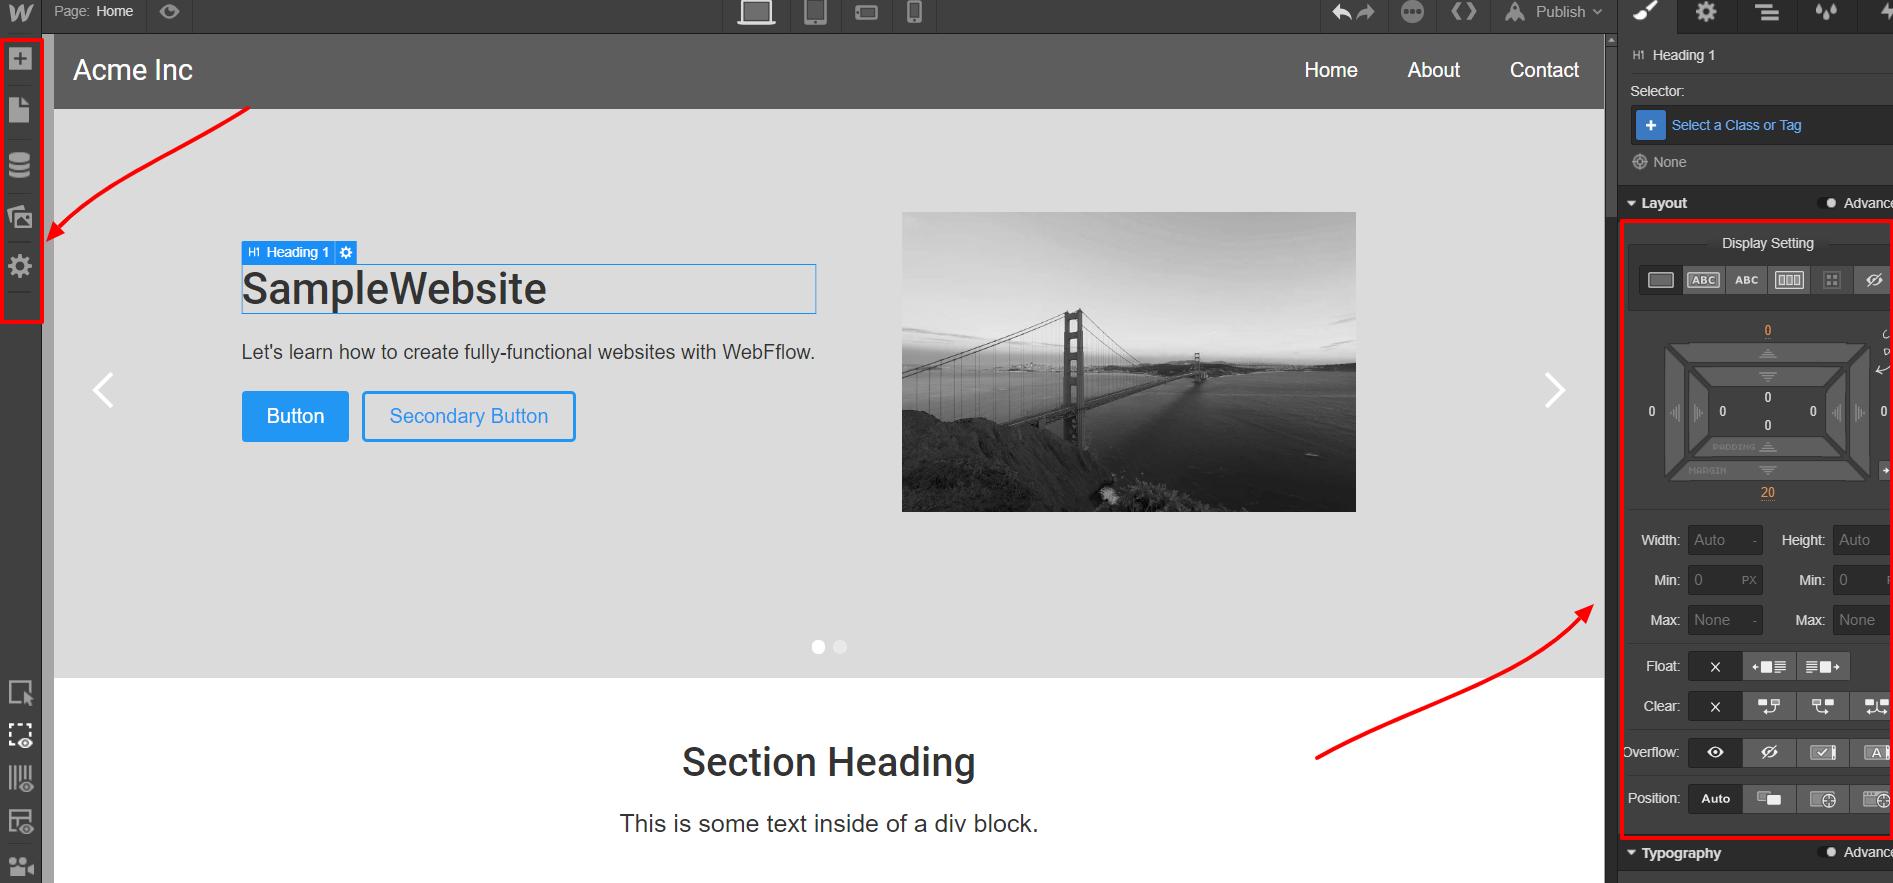 Webflow - Website Designer Tool